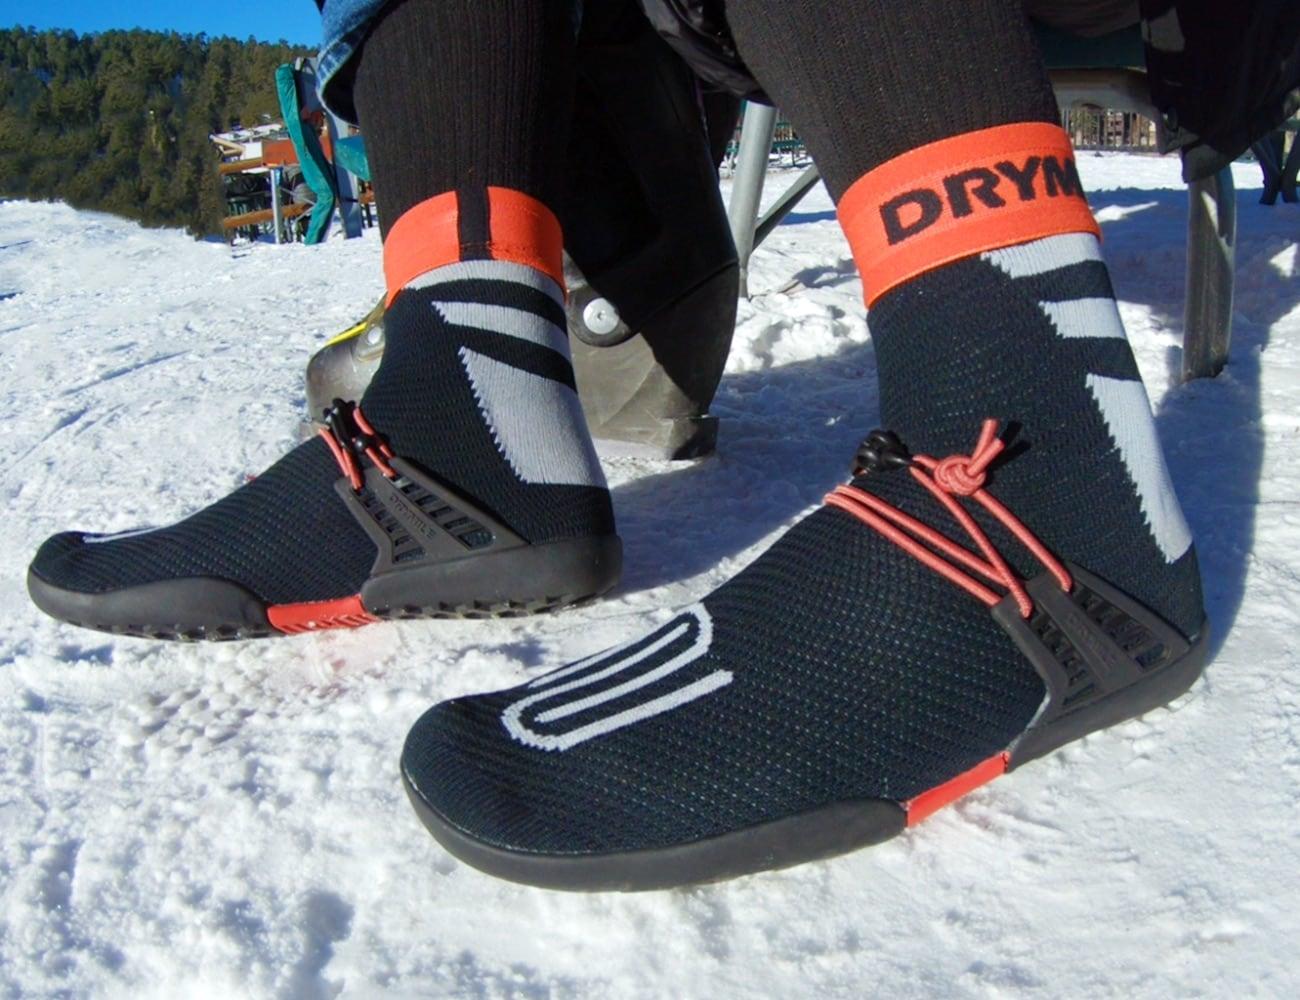 DRYMILE Packable Waterproof Sock Shoes keep your feet protected